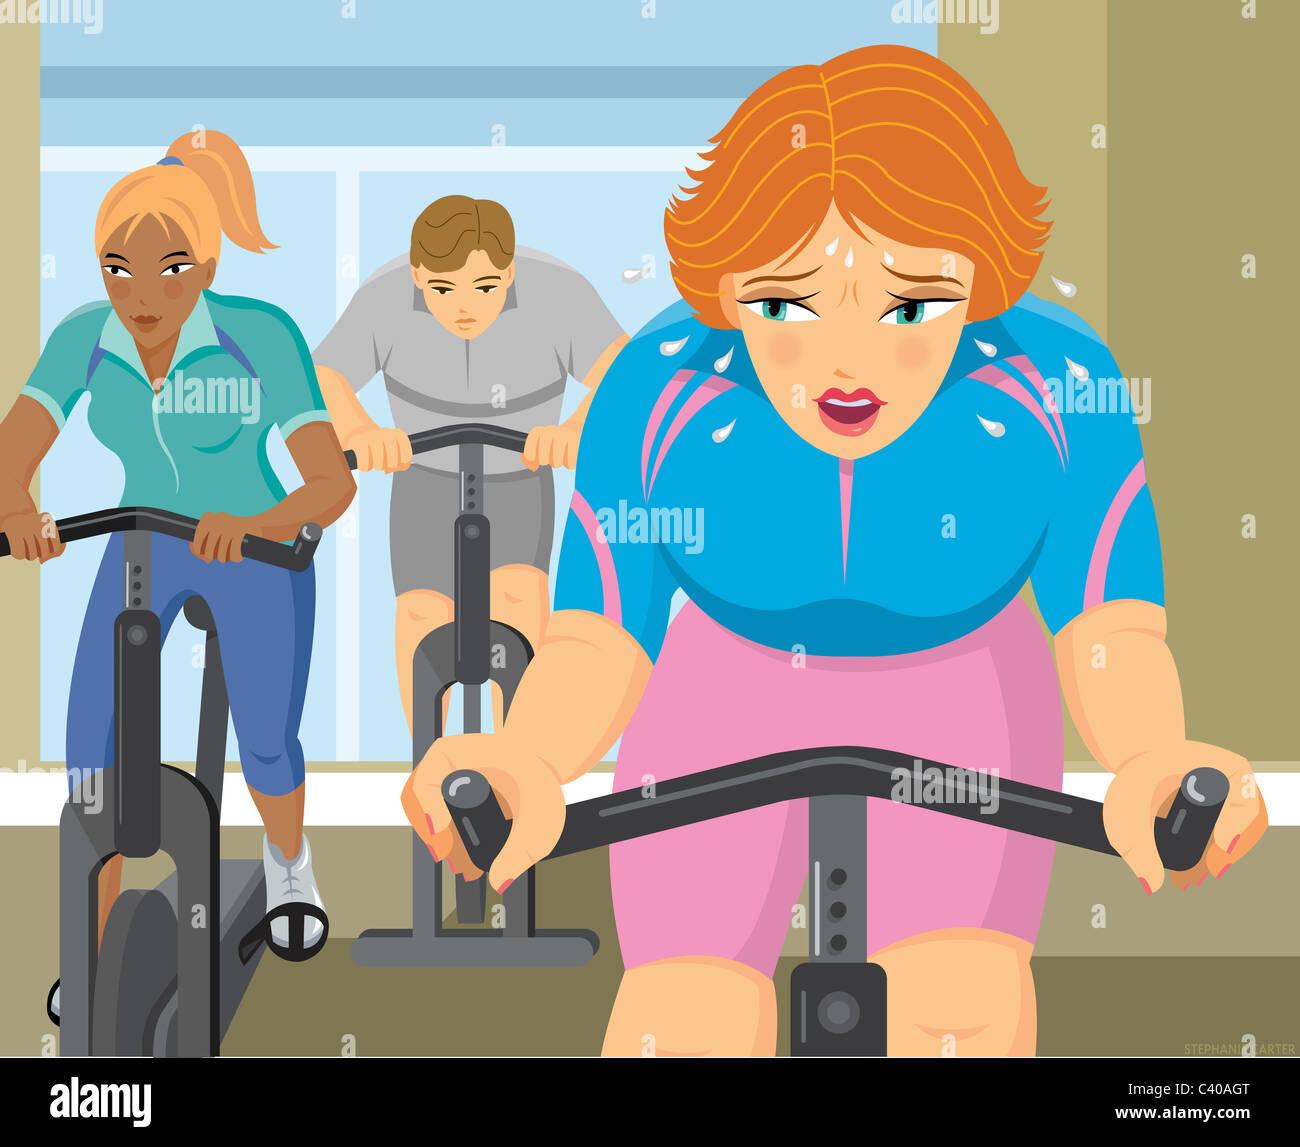 Abbildung einer Frau in einem-cycling-Kurs Stockbild